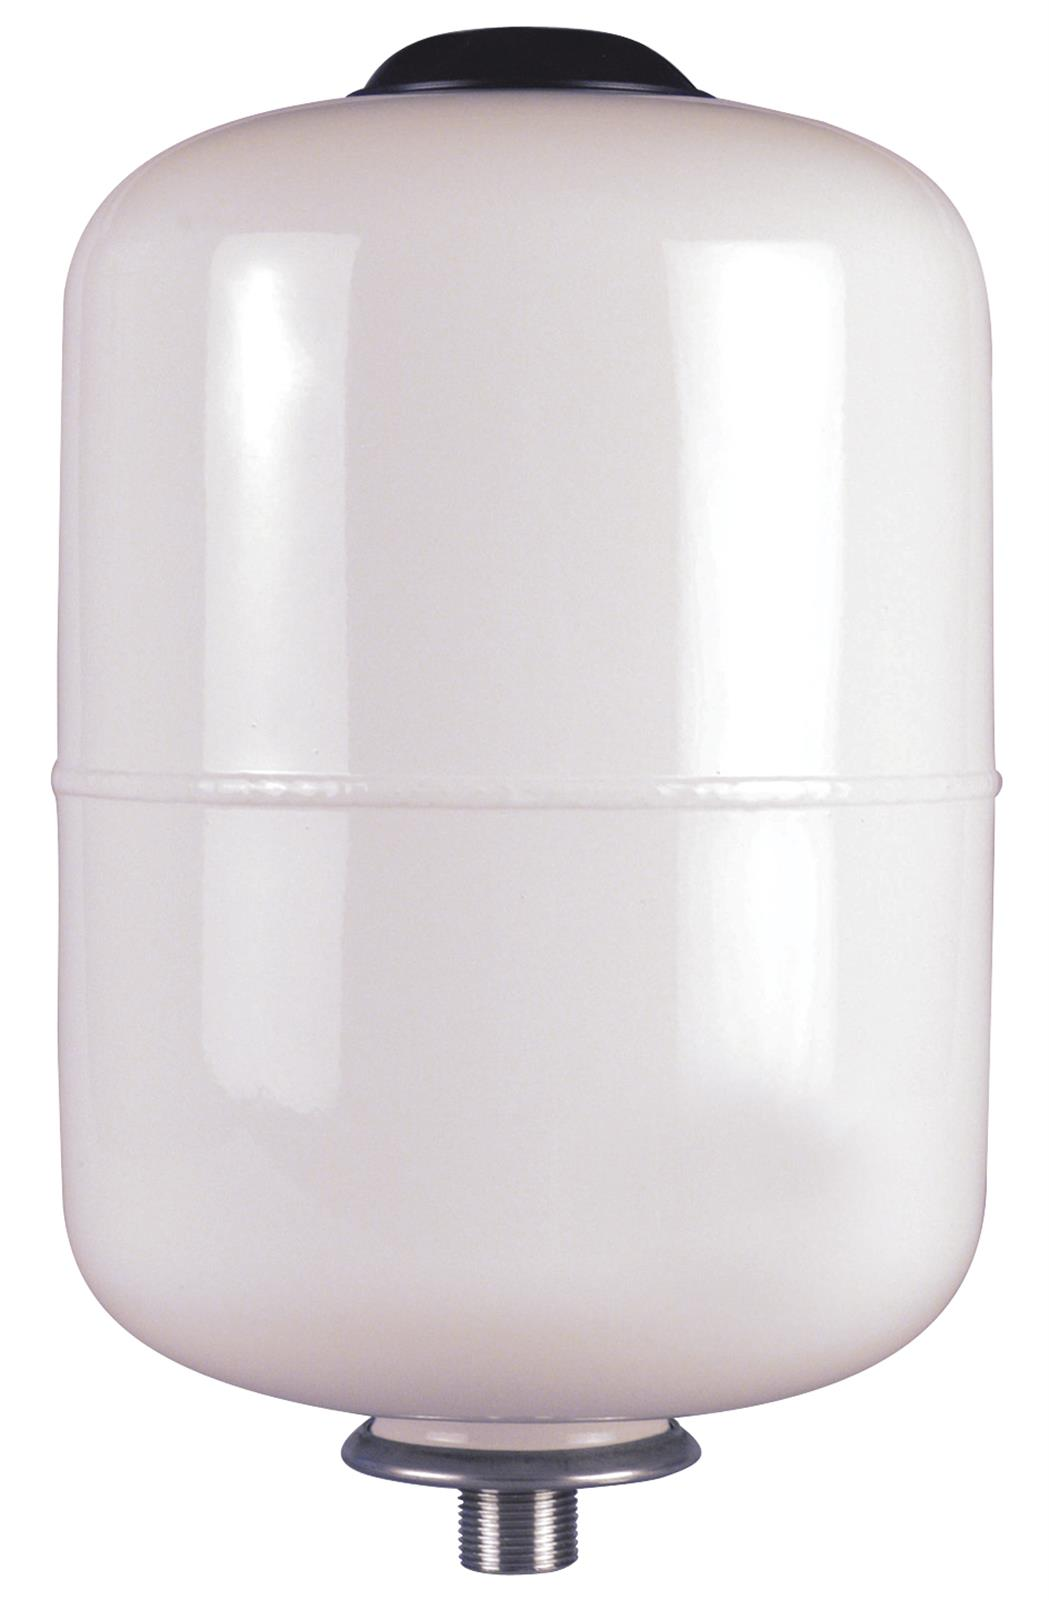 vase d 39 39 expansion vexbal pour chauffe eau thermador. Black Bedroom Furniture Sets. Home Design Ideas